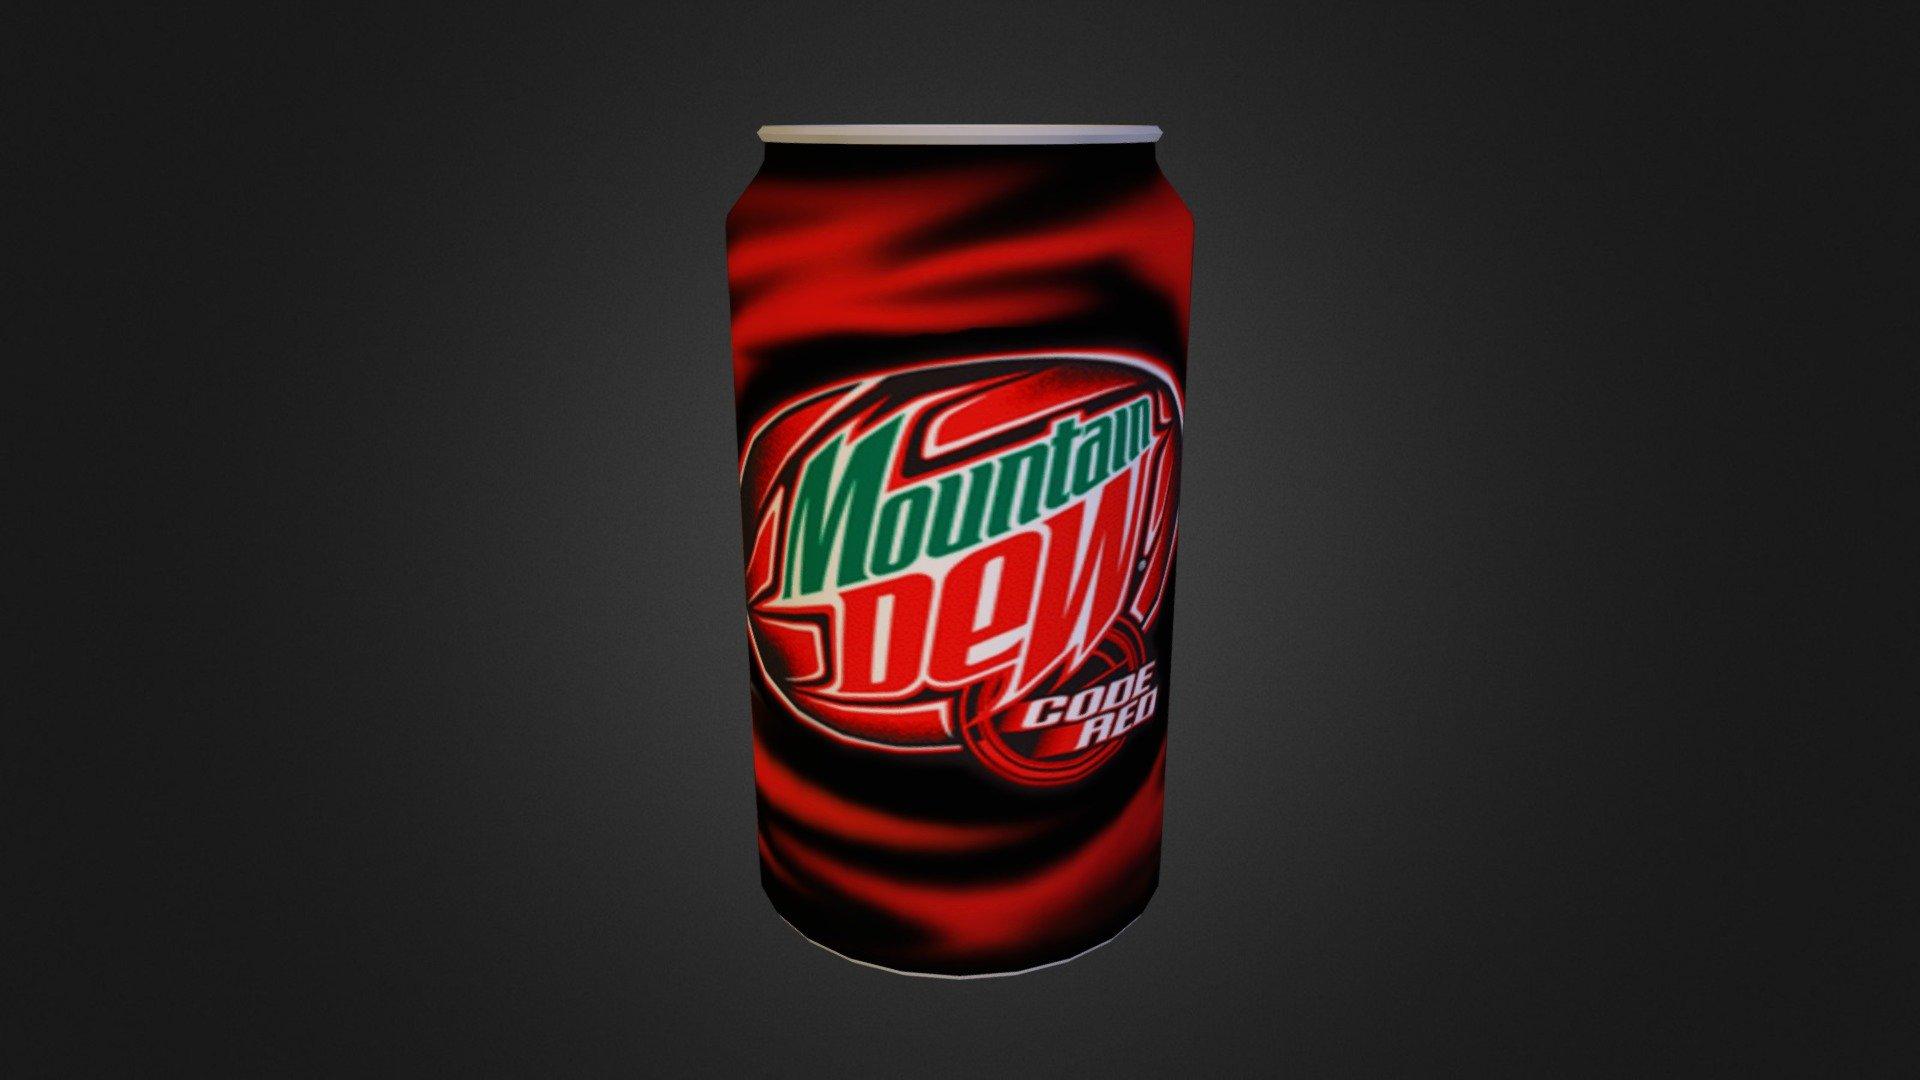 Fucking mountain dew bottle